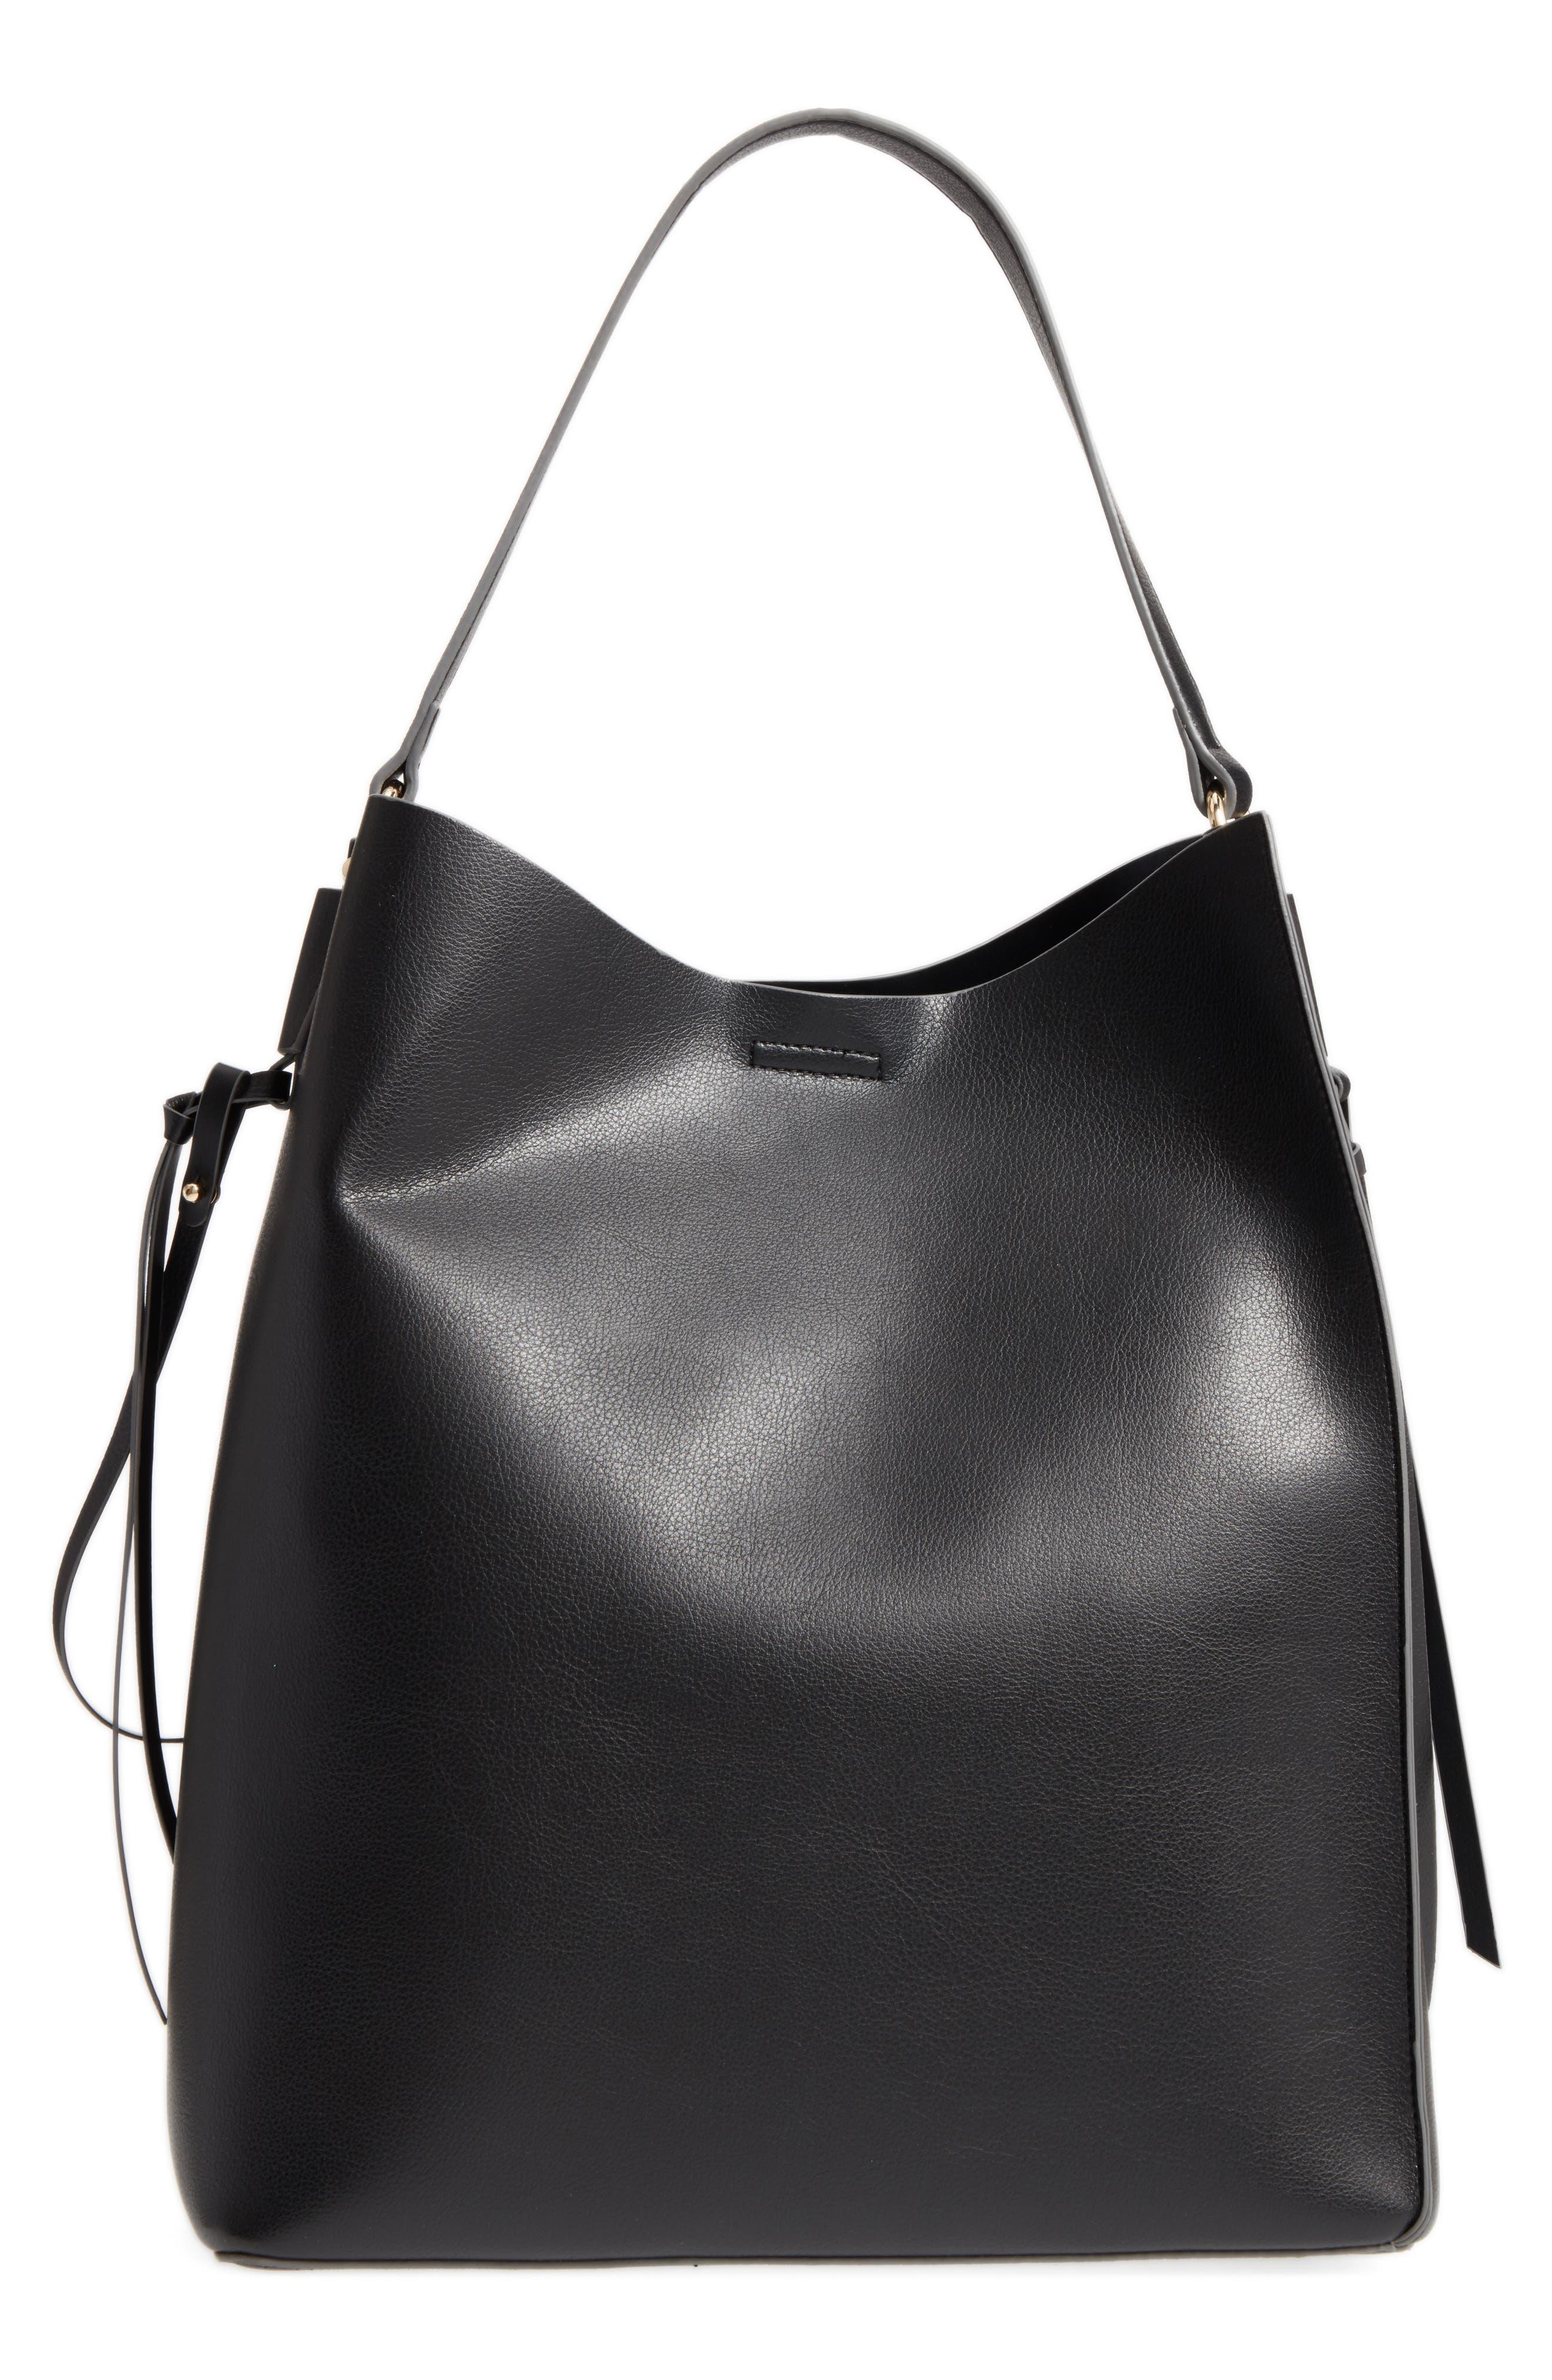 Prima Faux Leather Bucket Bag & Zip Pouch,                             Main thumbnail 1, color,                             001